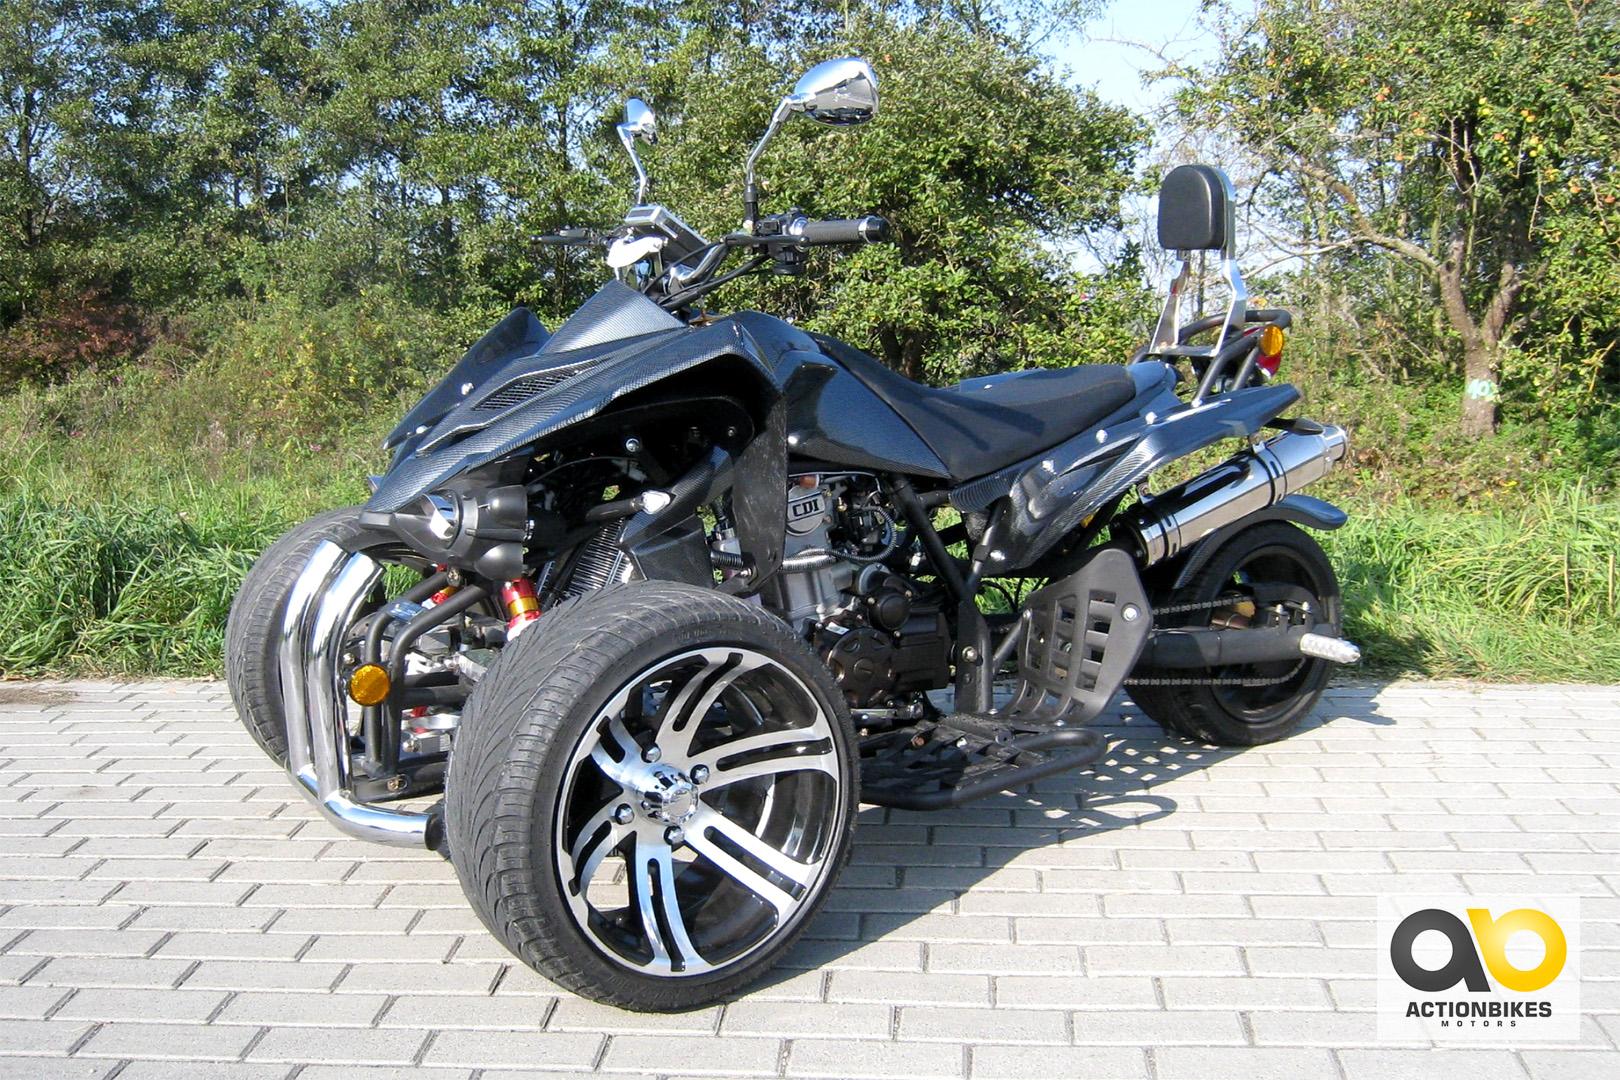 quad atv speedtrike 250 cc trike jla 923e 1 carbon look. Black Bedroom Furniture Sets. Home Design Ideas